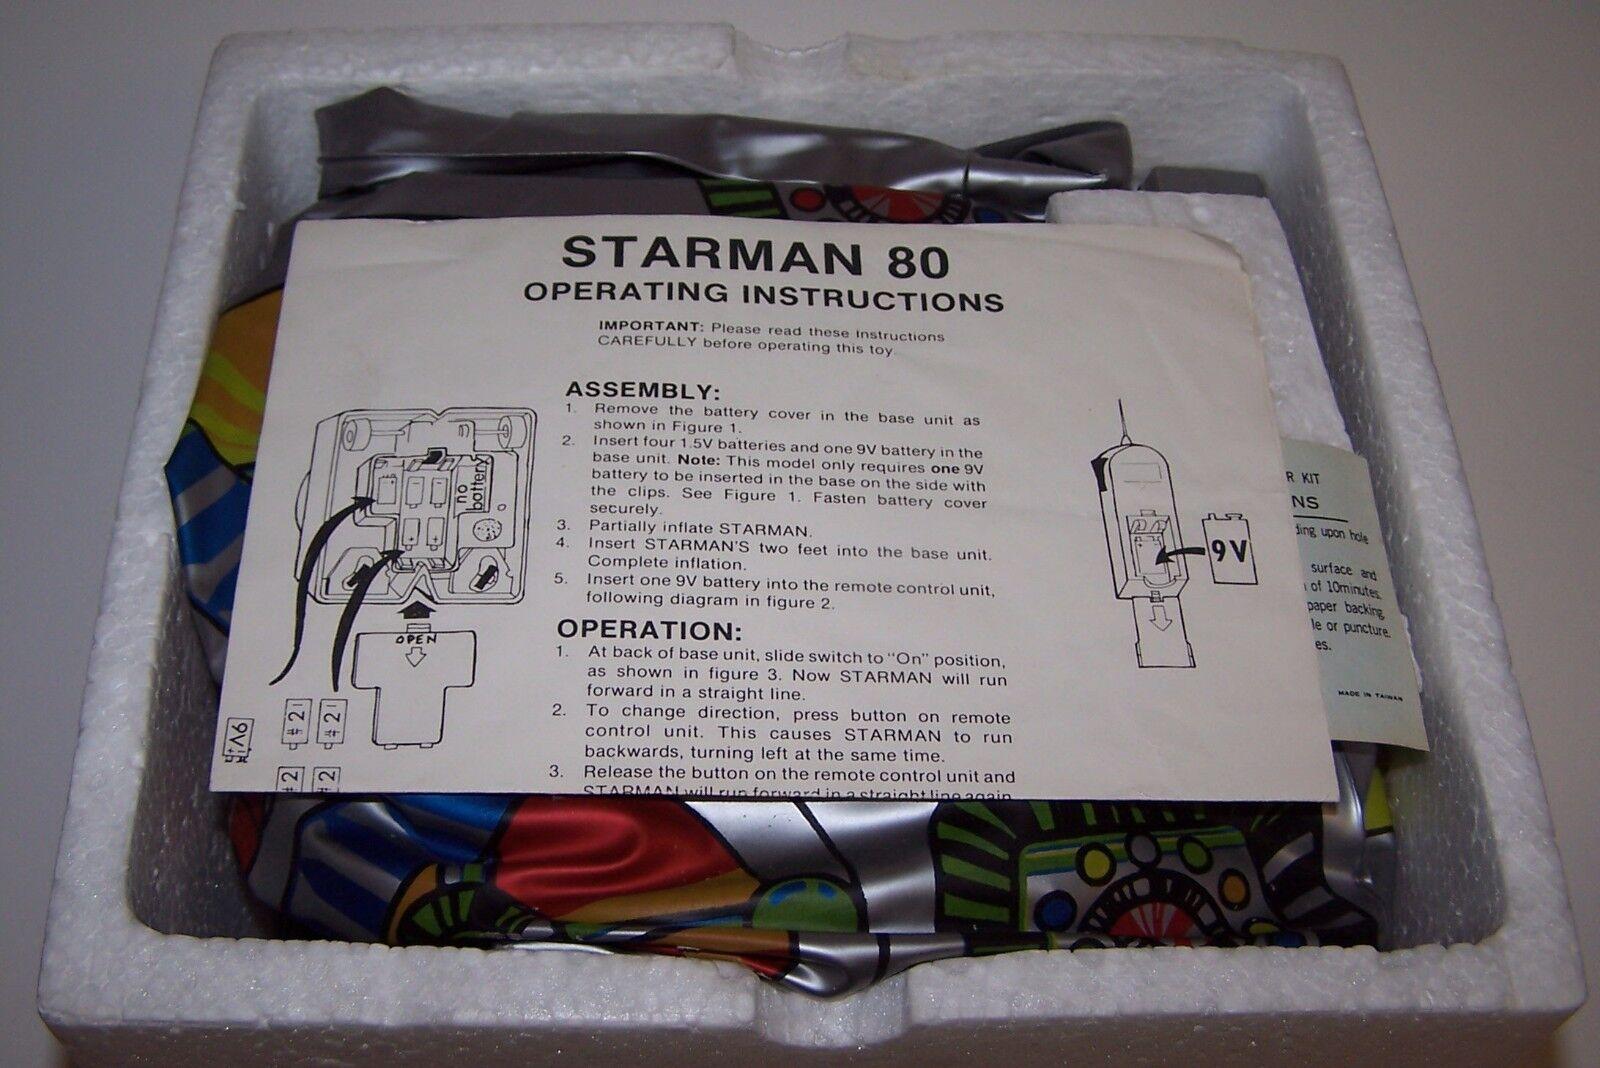 Starman 80 Electronic Electronic Electronic Remote Controlled Blow Up Robot 3.5 Feet Tall 1979 NIB 960564